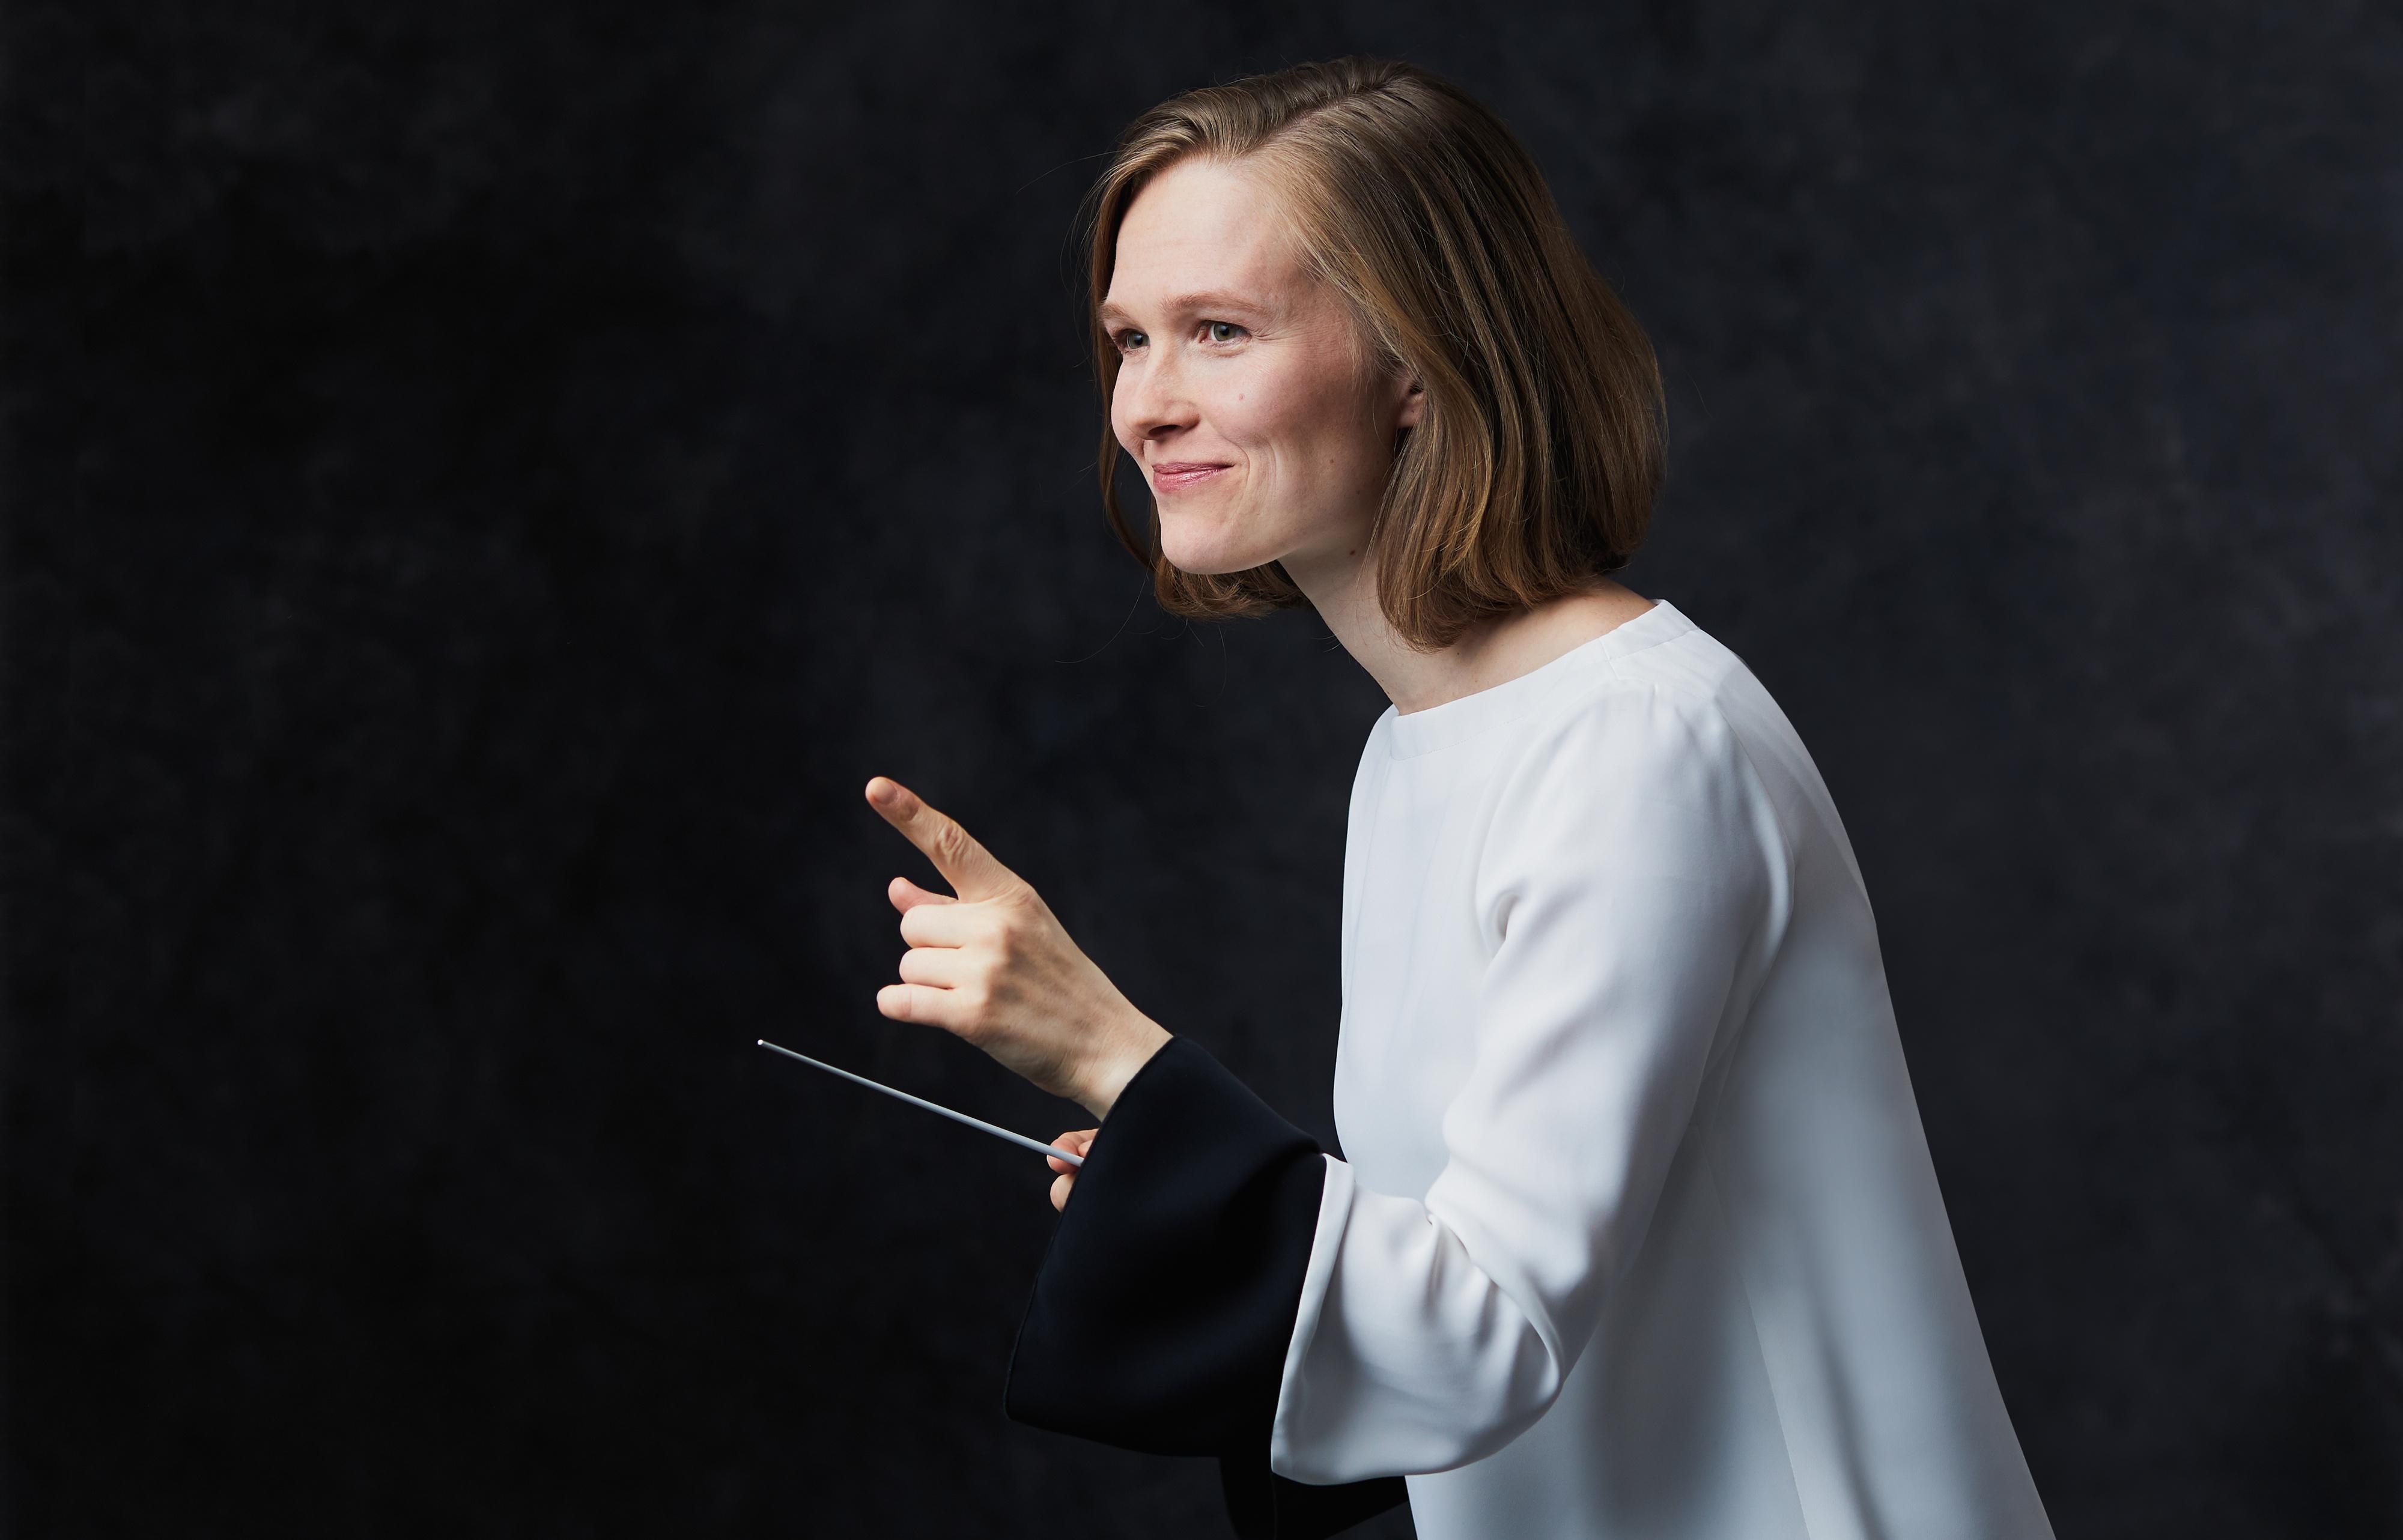 Mirga Gražinytė-Tyla: 'British orchestras don't have an easy life'